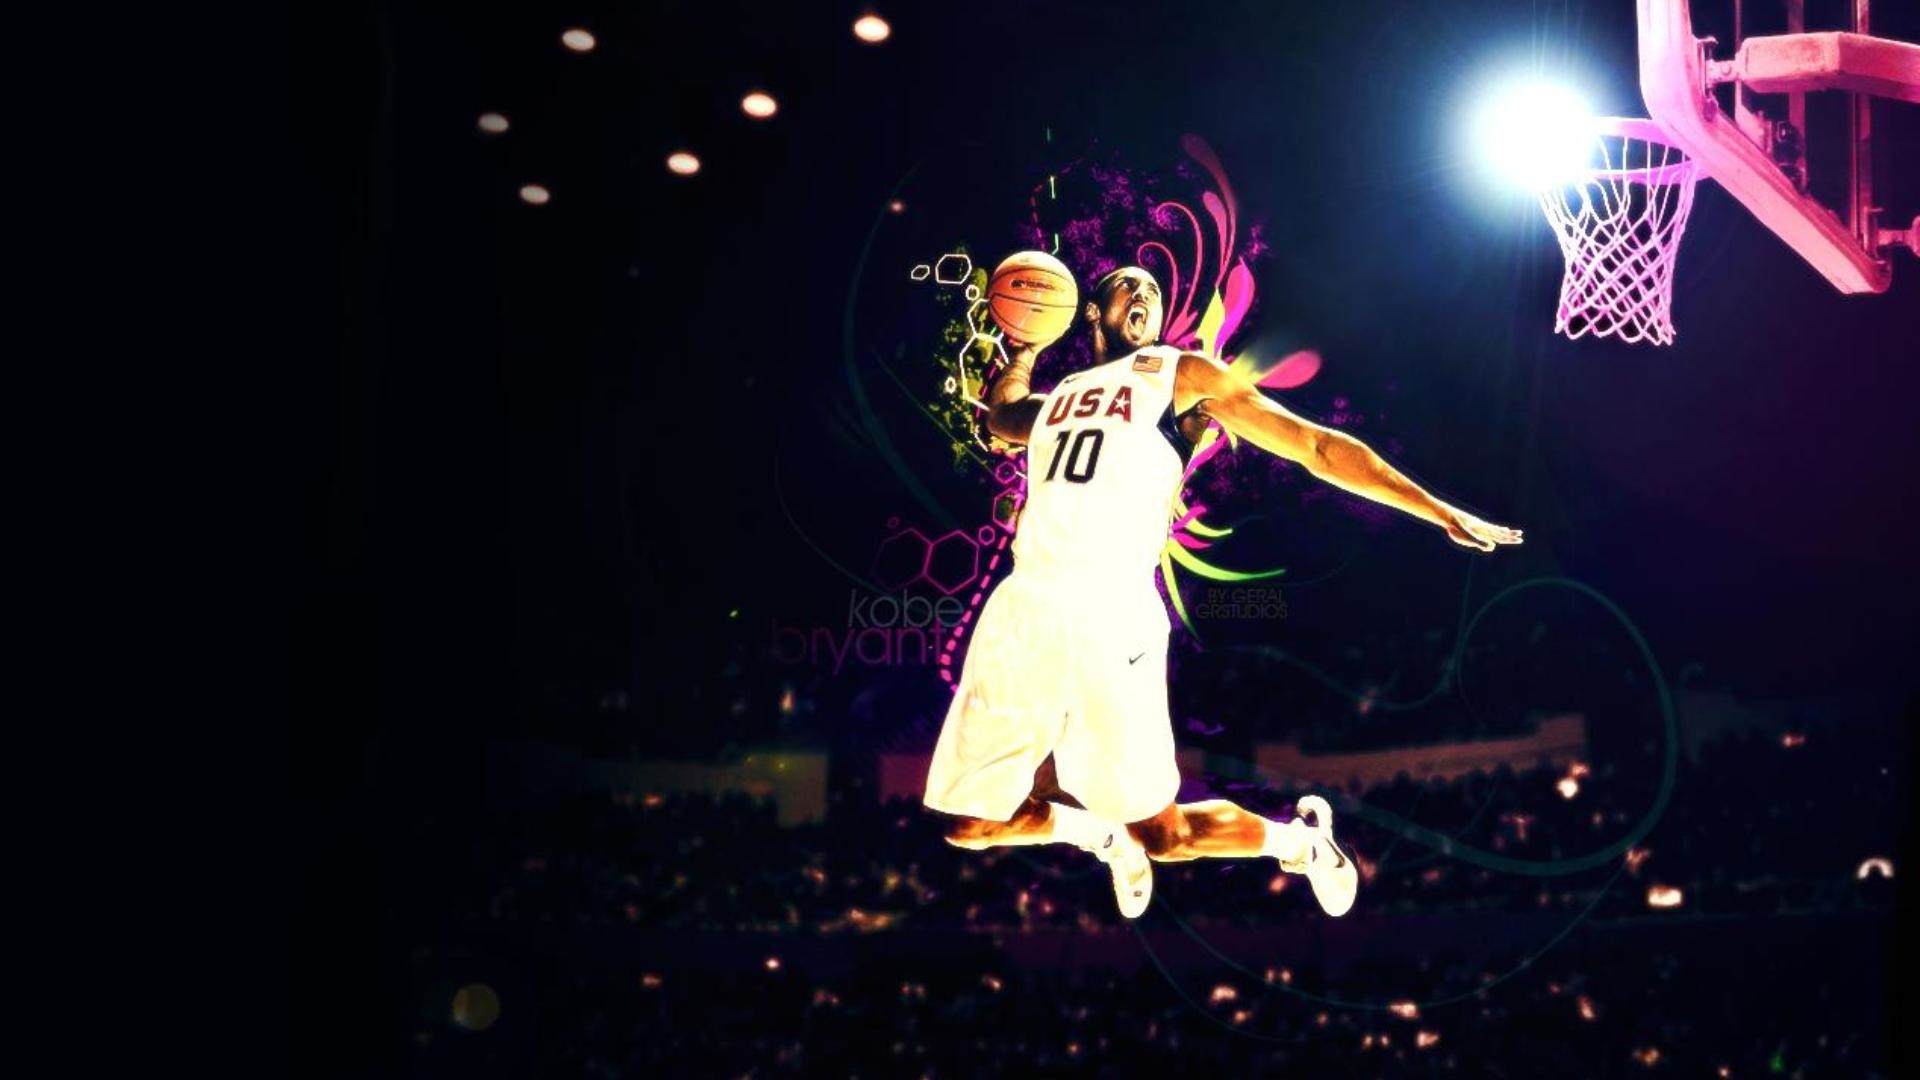 Kobe bryant hd wallpapers desktop background.